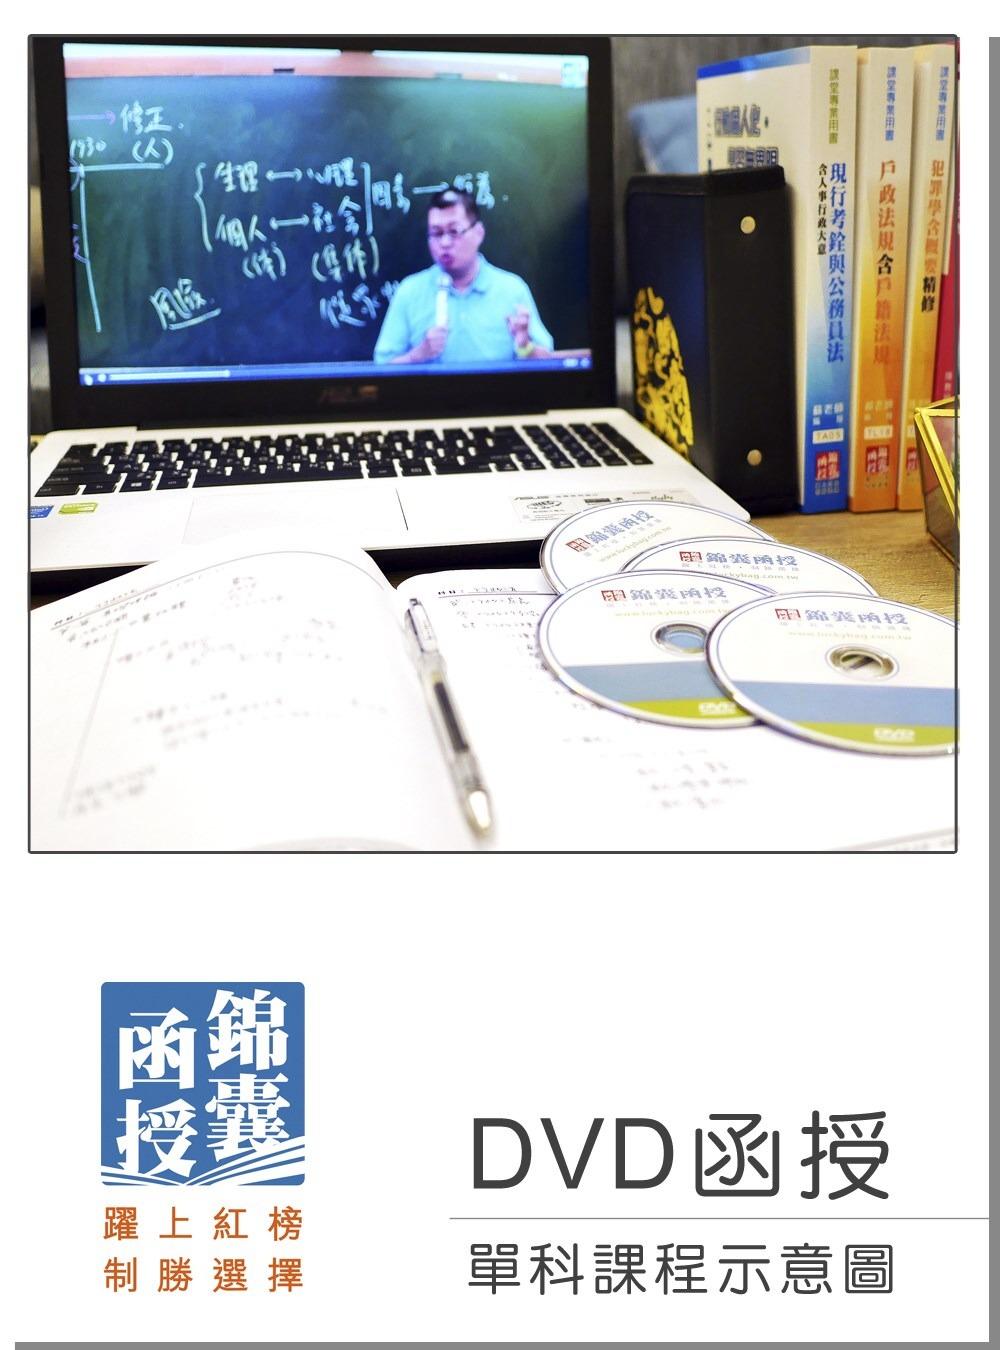 【DVD函授】行政法:單科課程(107版)